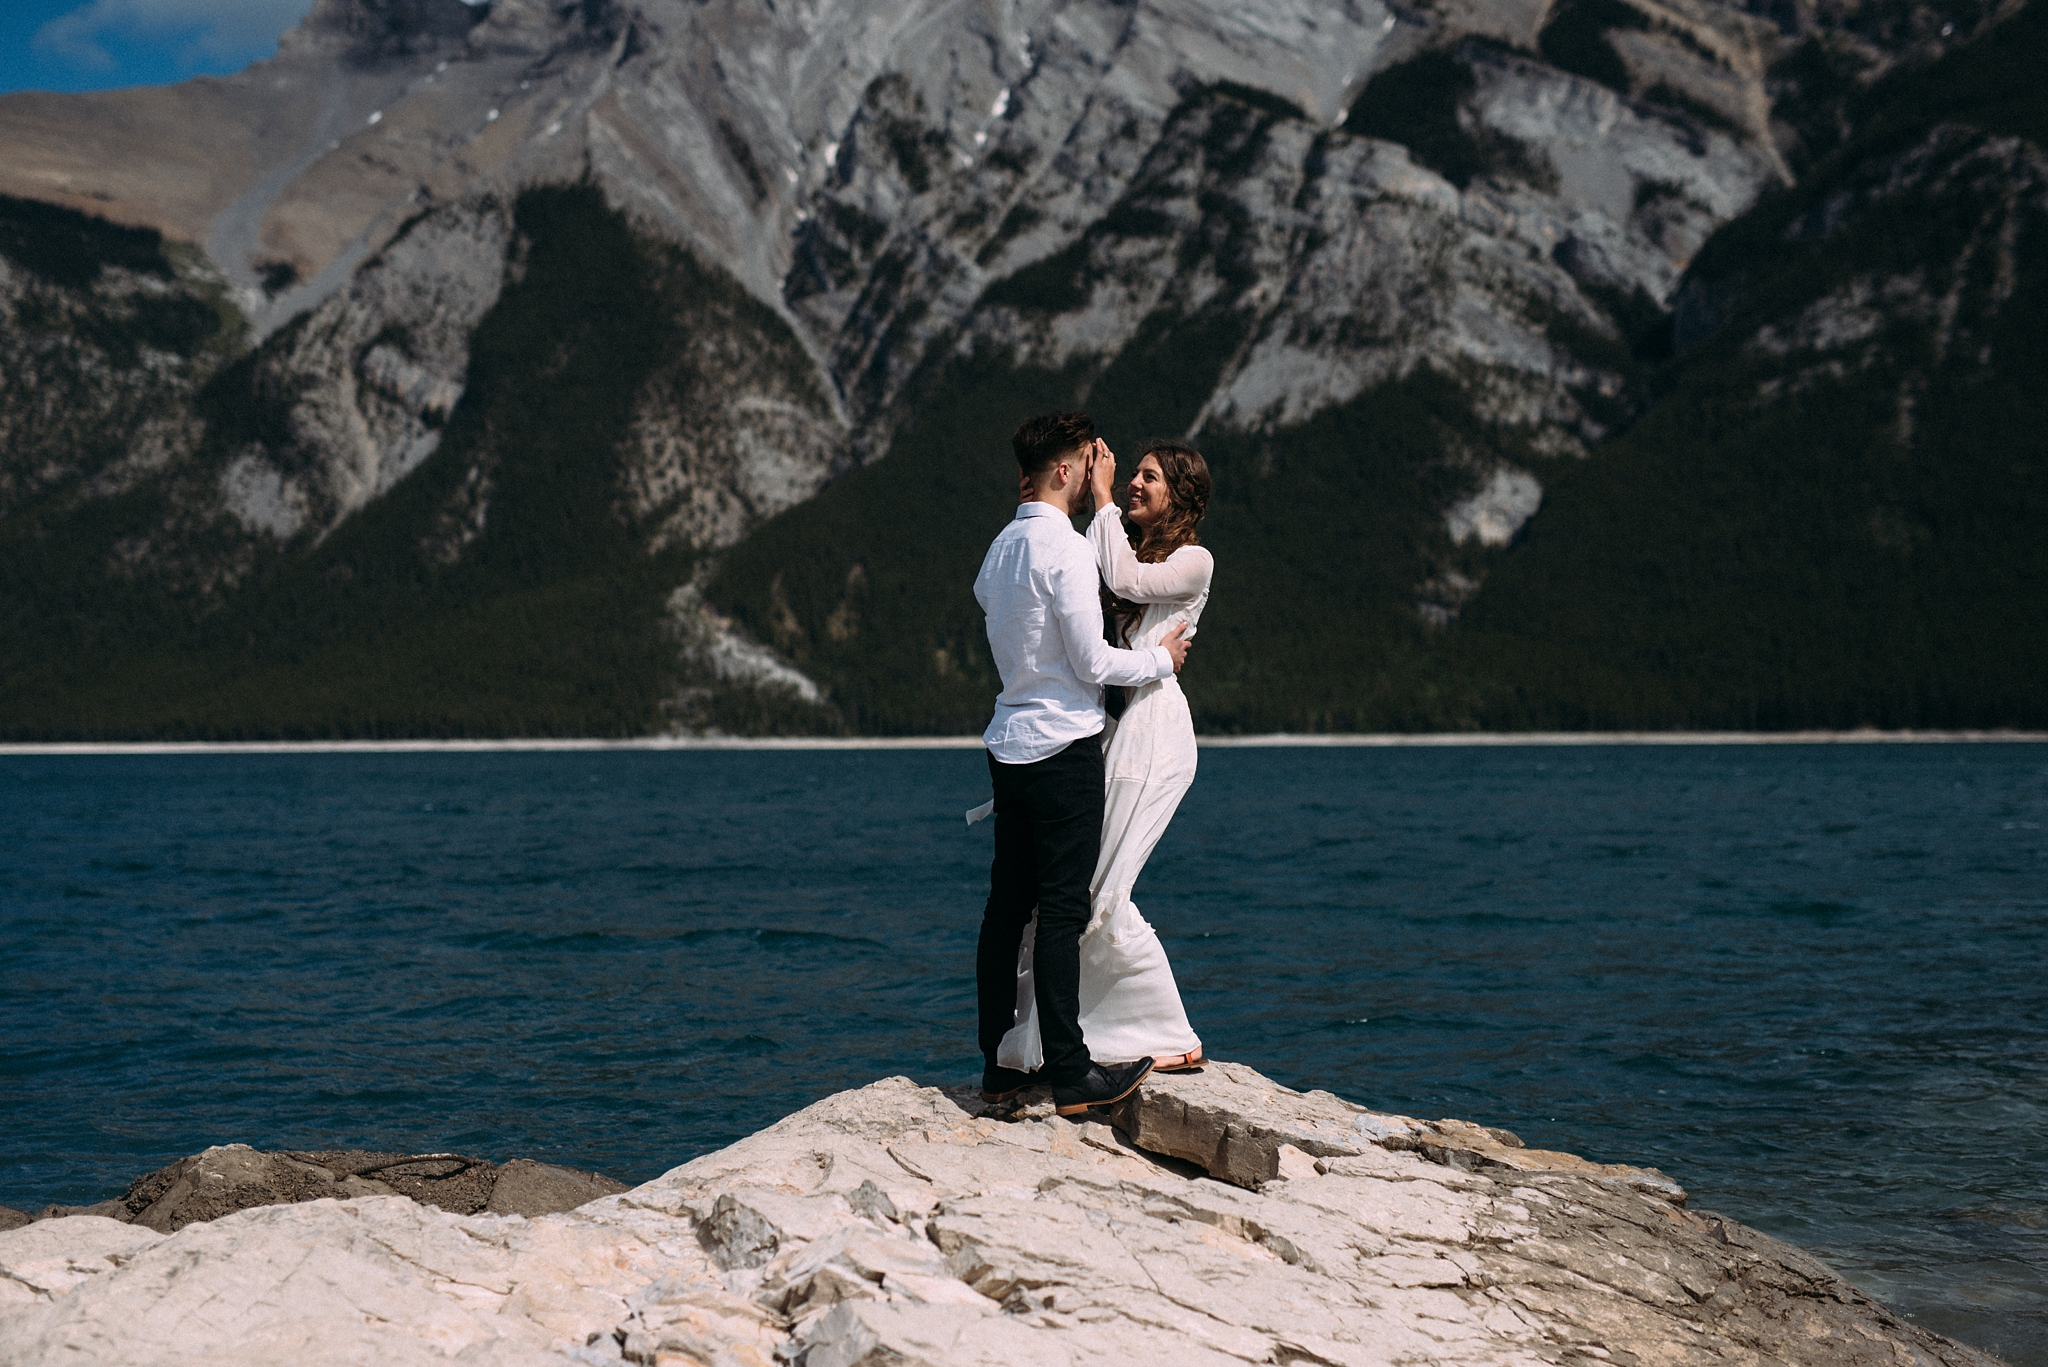 kaihla_tonai_intimate_wedding_elopement_photographer_4105